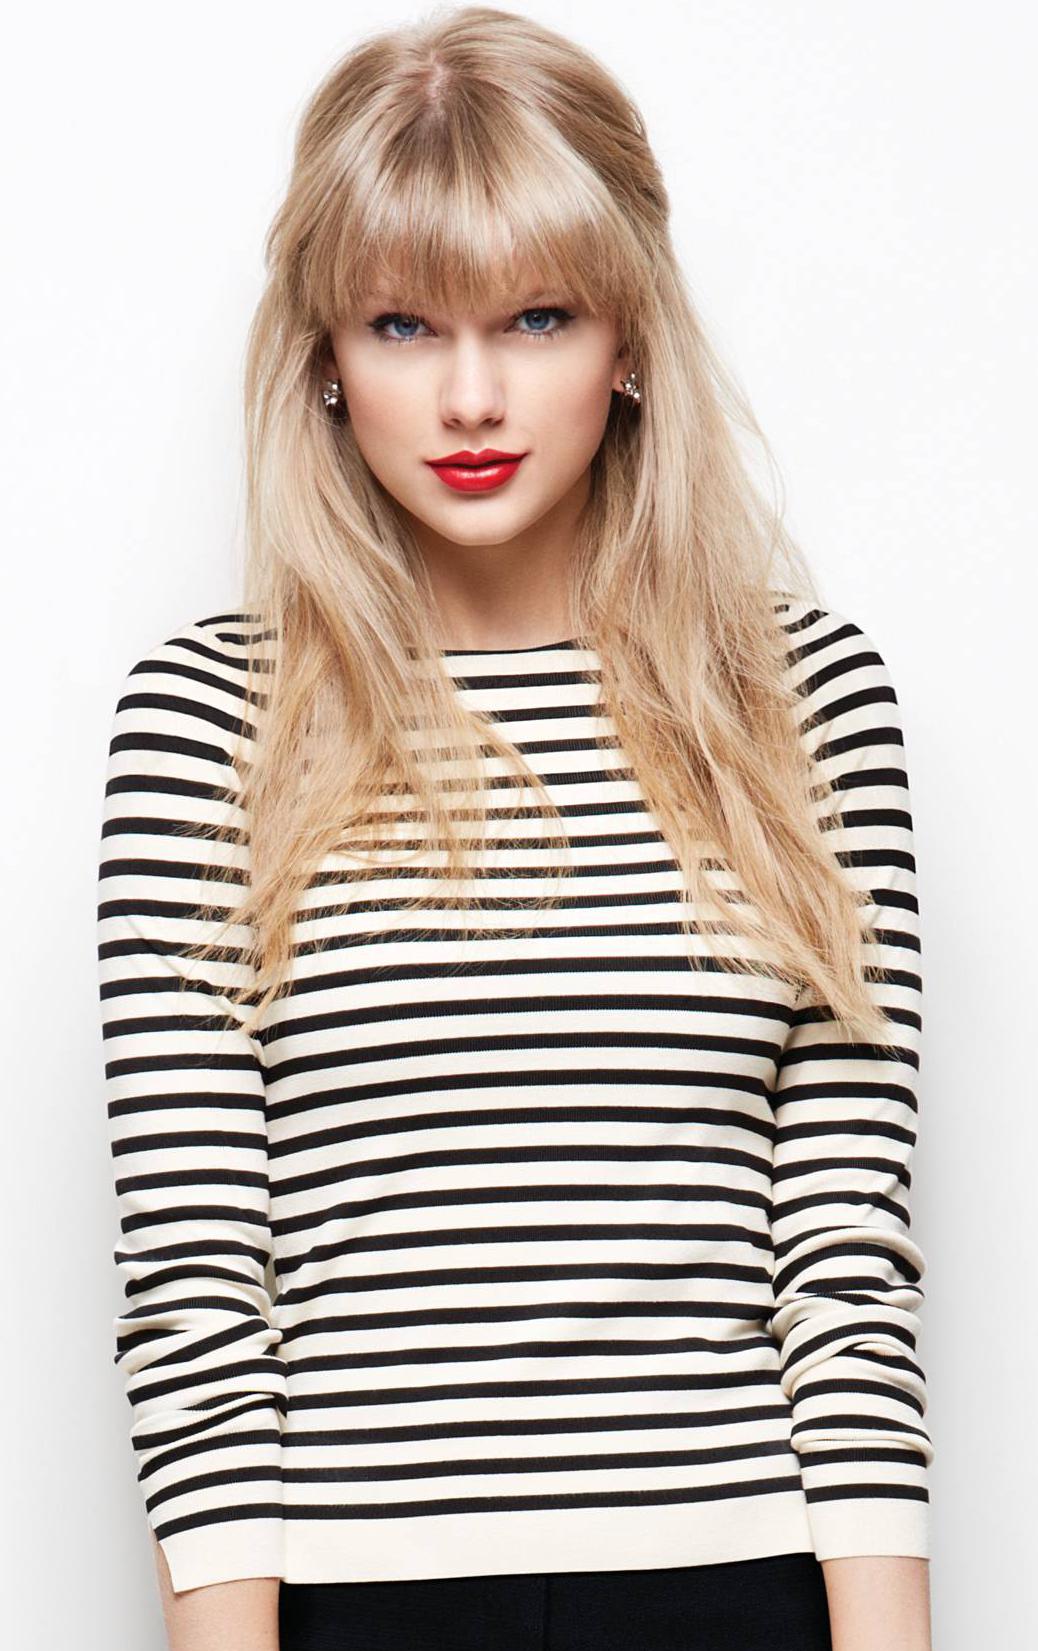 Taylor Swift In Vogue Magazine Australia November 2015: One Direction Wiki